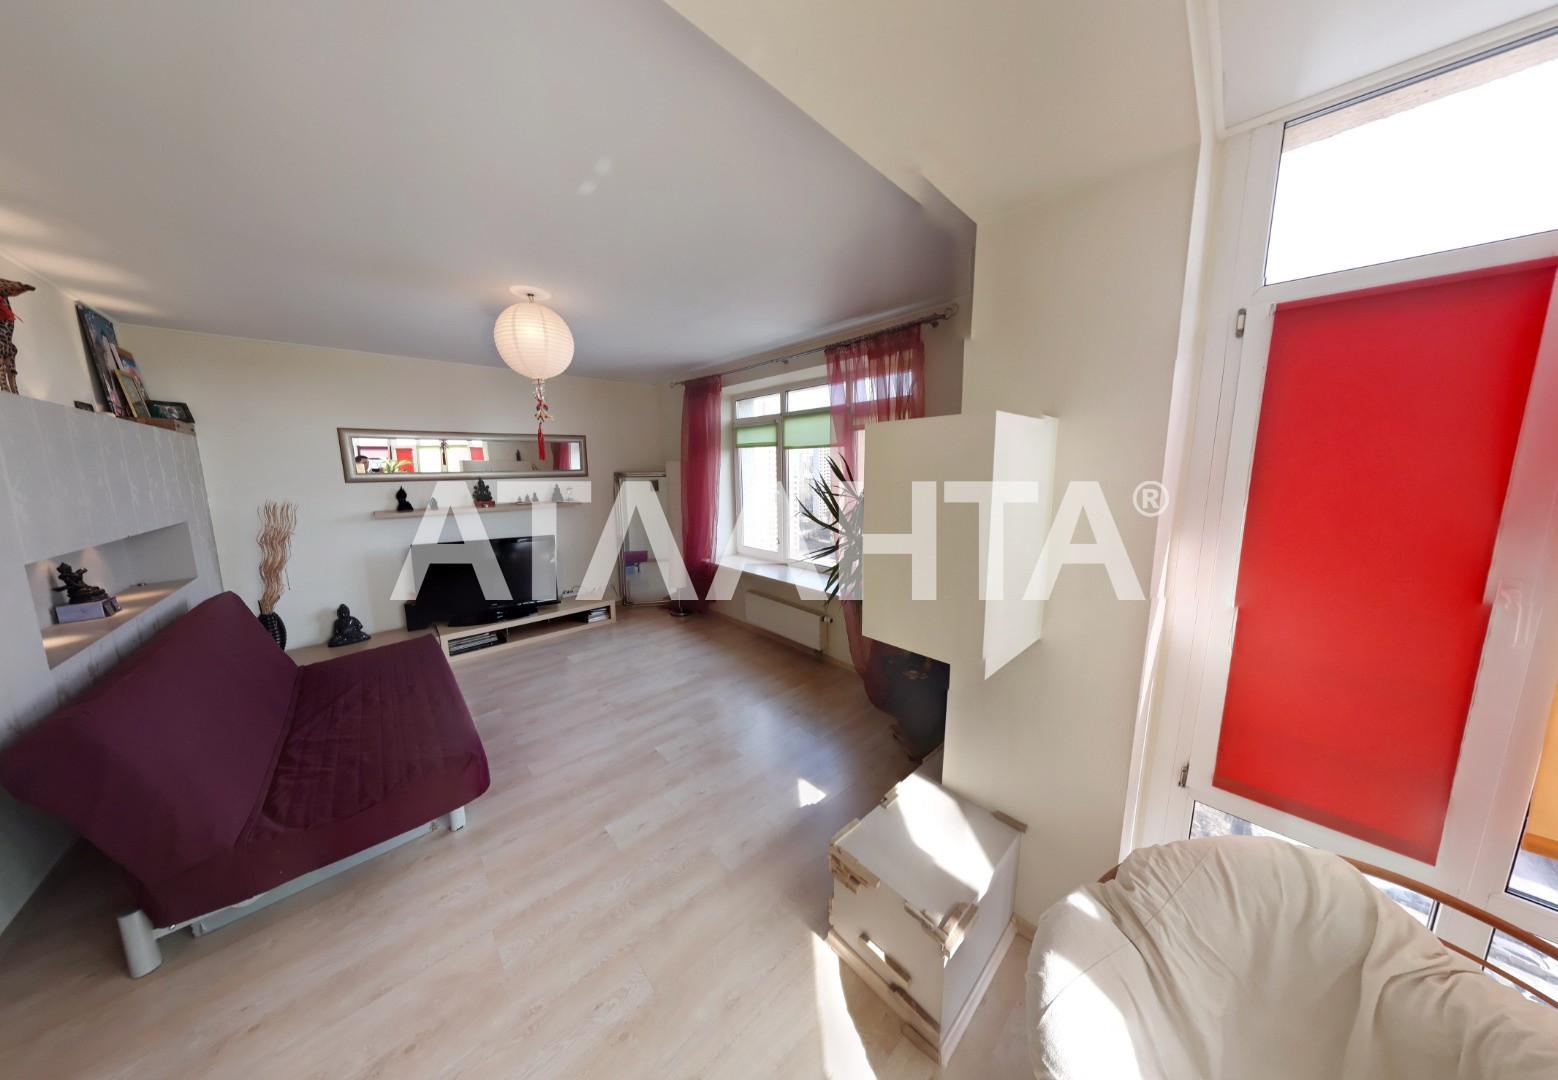 Продается 3-комнатная Квартира на ул. Ломоносова — 118 900 у.е. (фото №9)